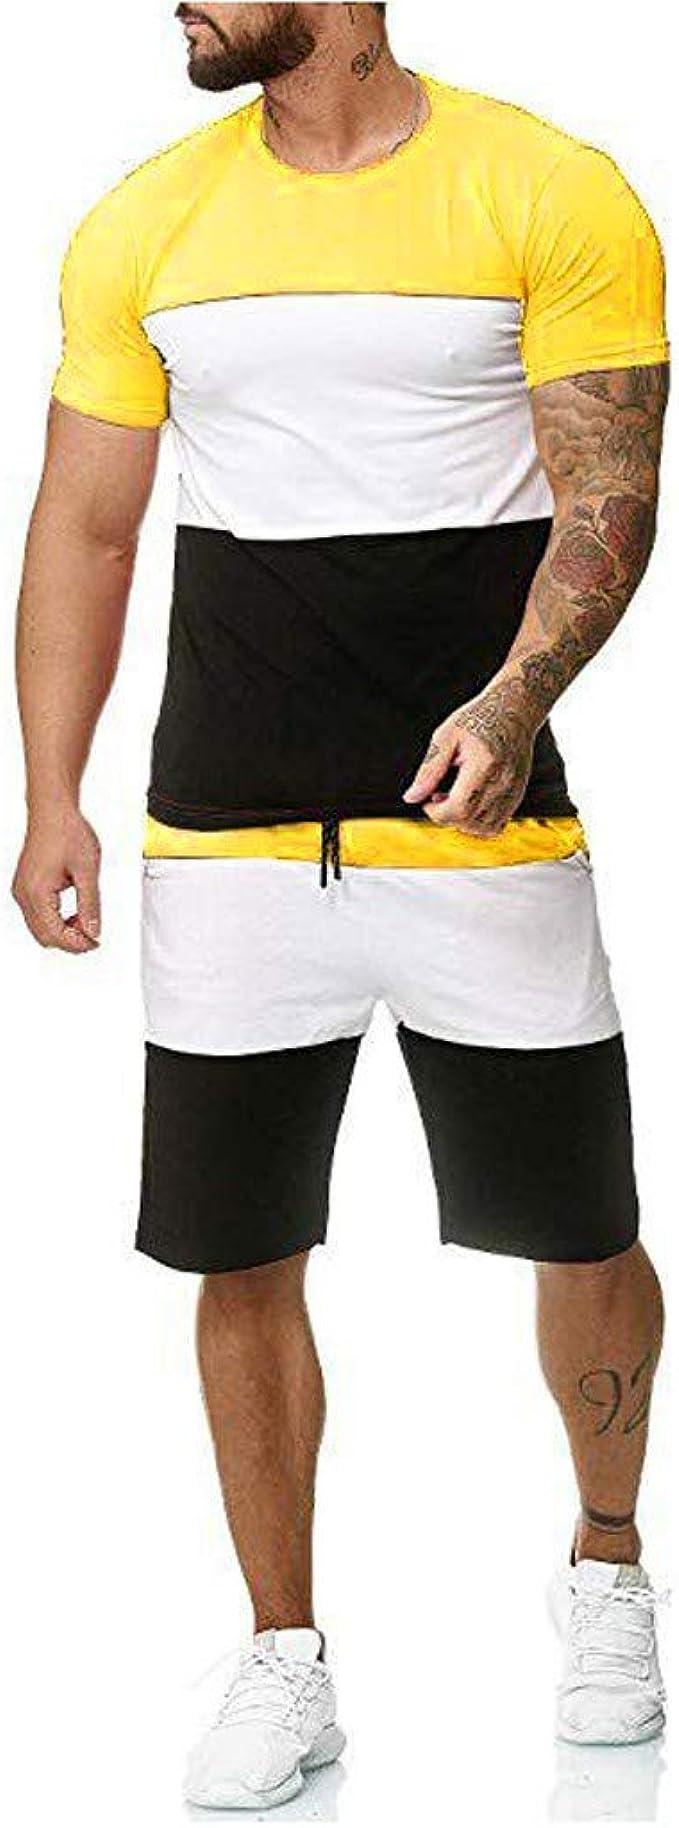 Holataa Chandal Hombre Completo Camiseta Manga Corta + Pantalones ...